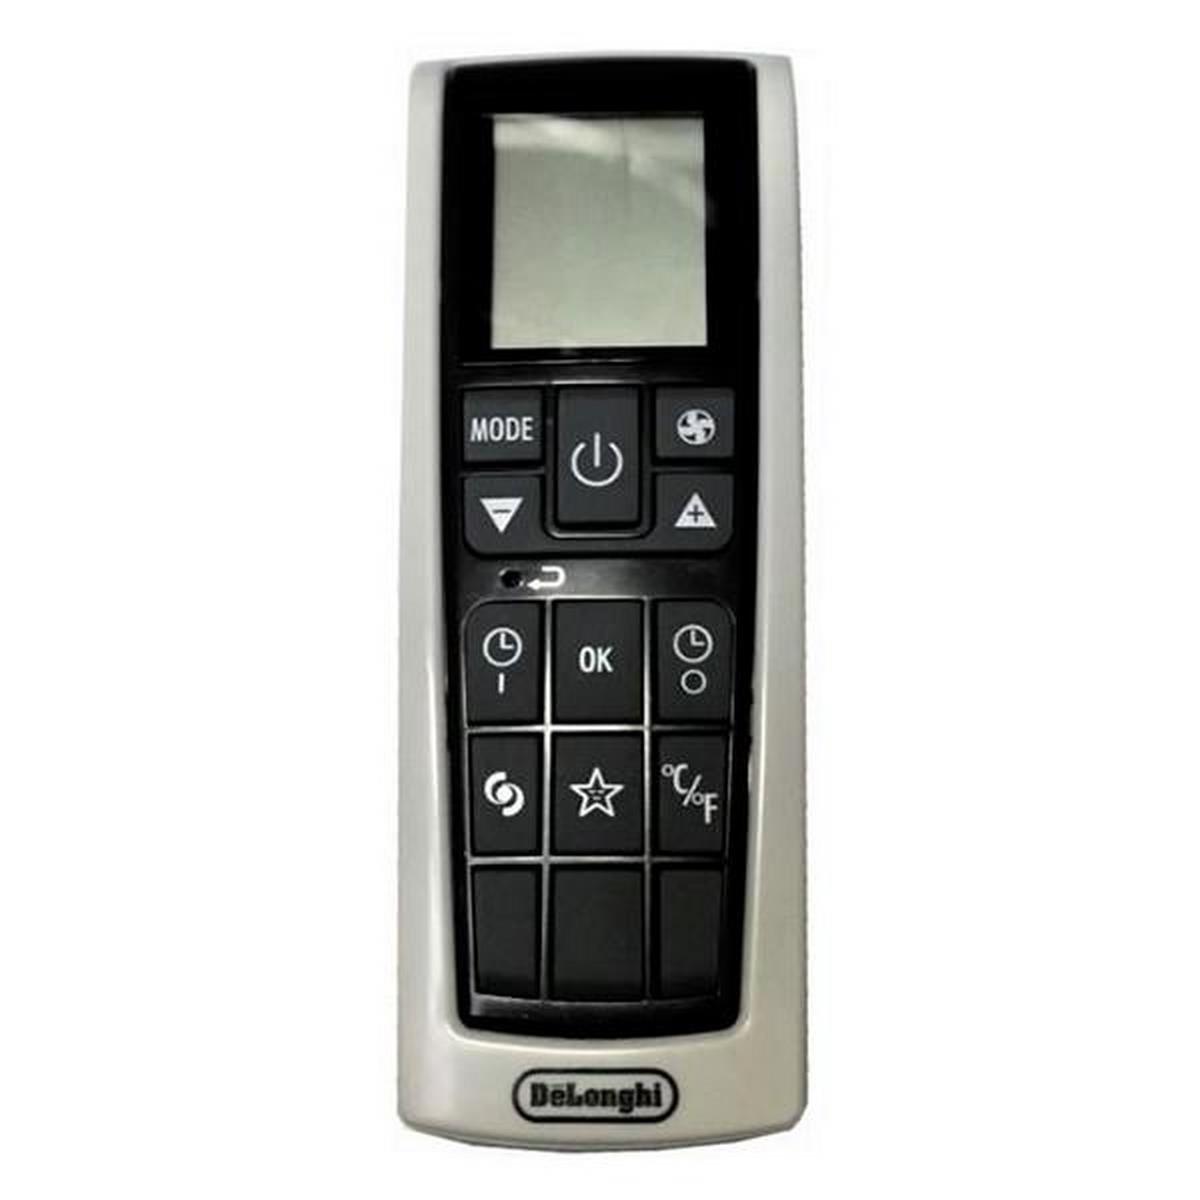 Delonghi telecomando controllo Pinguino PAC WE ECO Silent 17 18 110 125 126 130 De' Longhi 5515110271